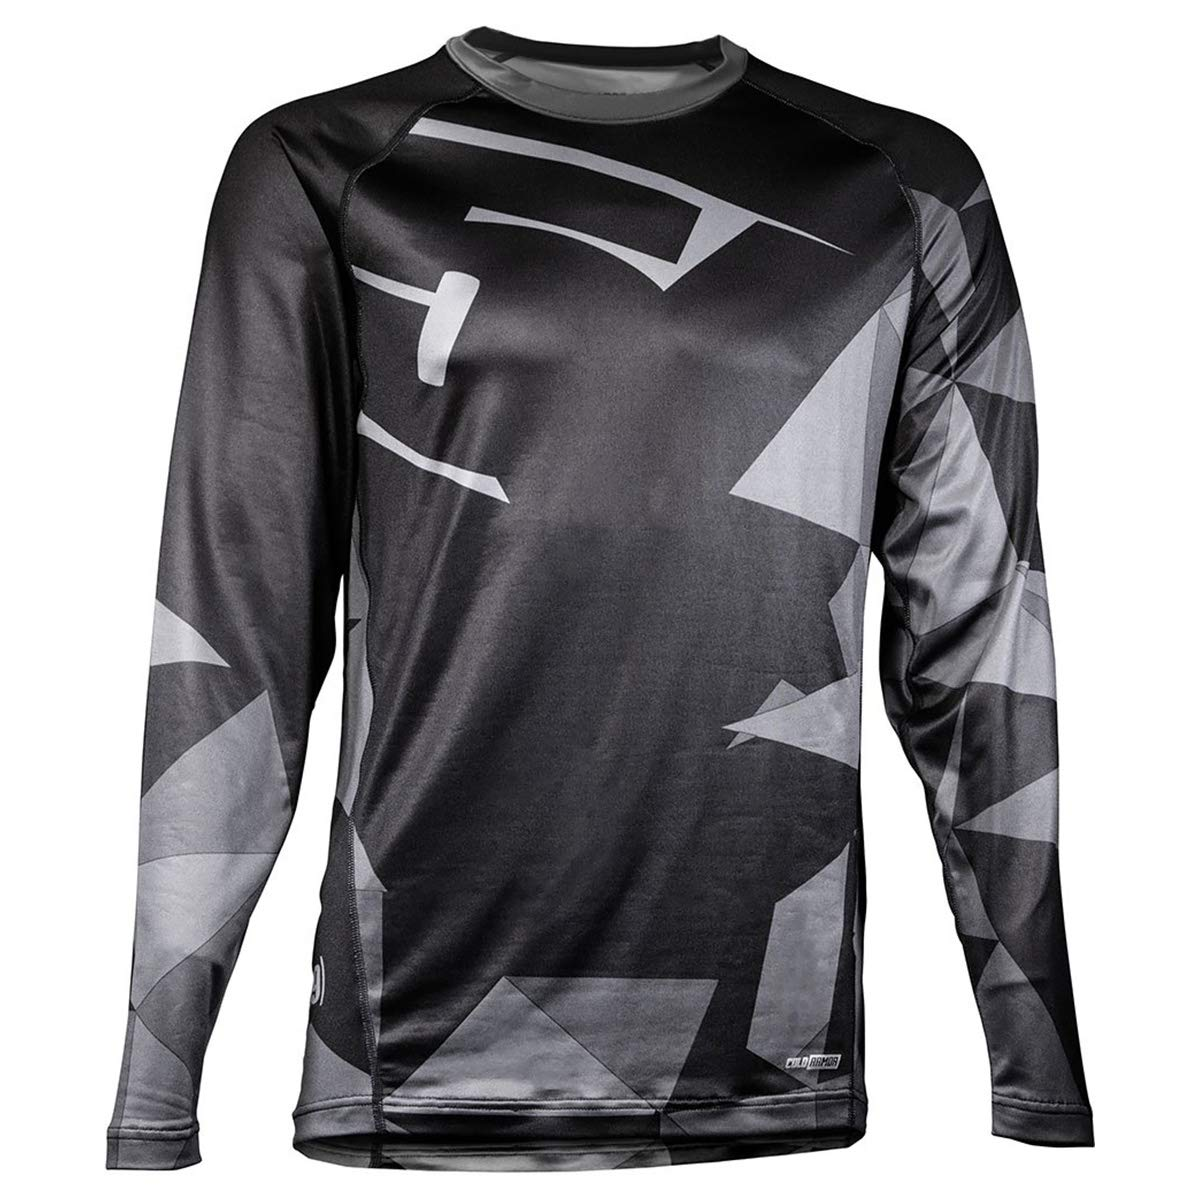 509 FZN Base Shirt Black Ops Level 1